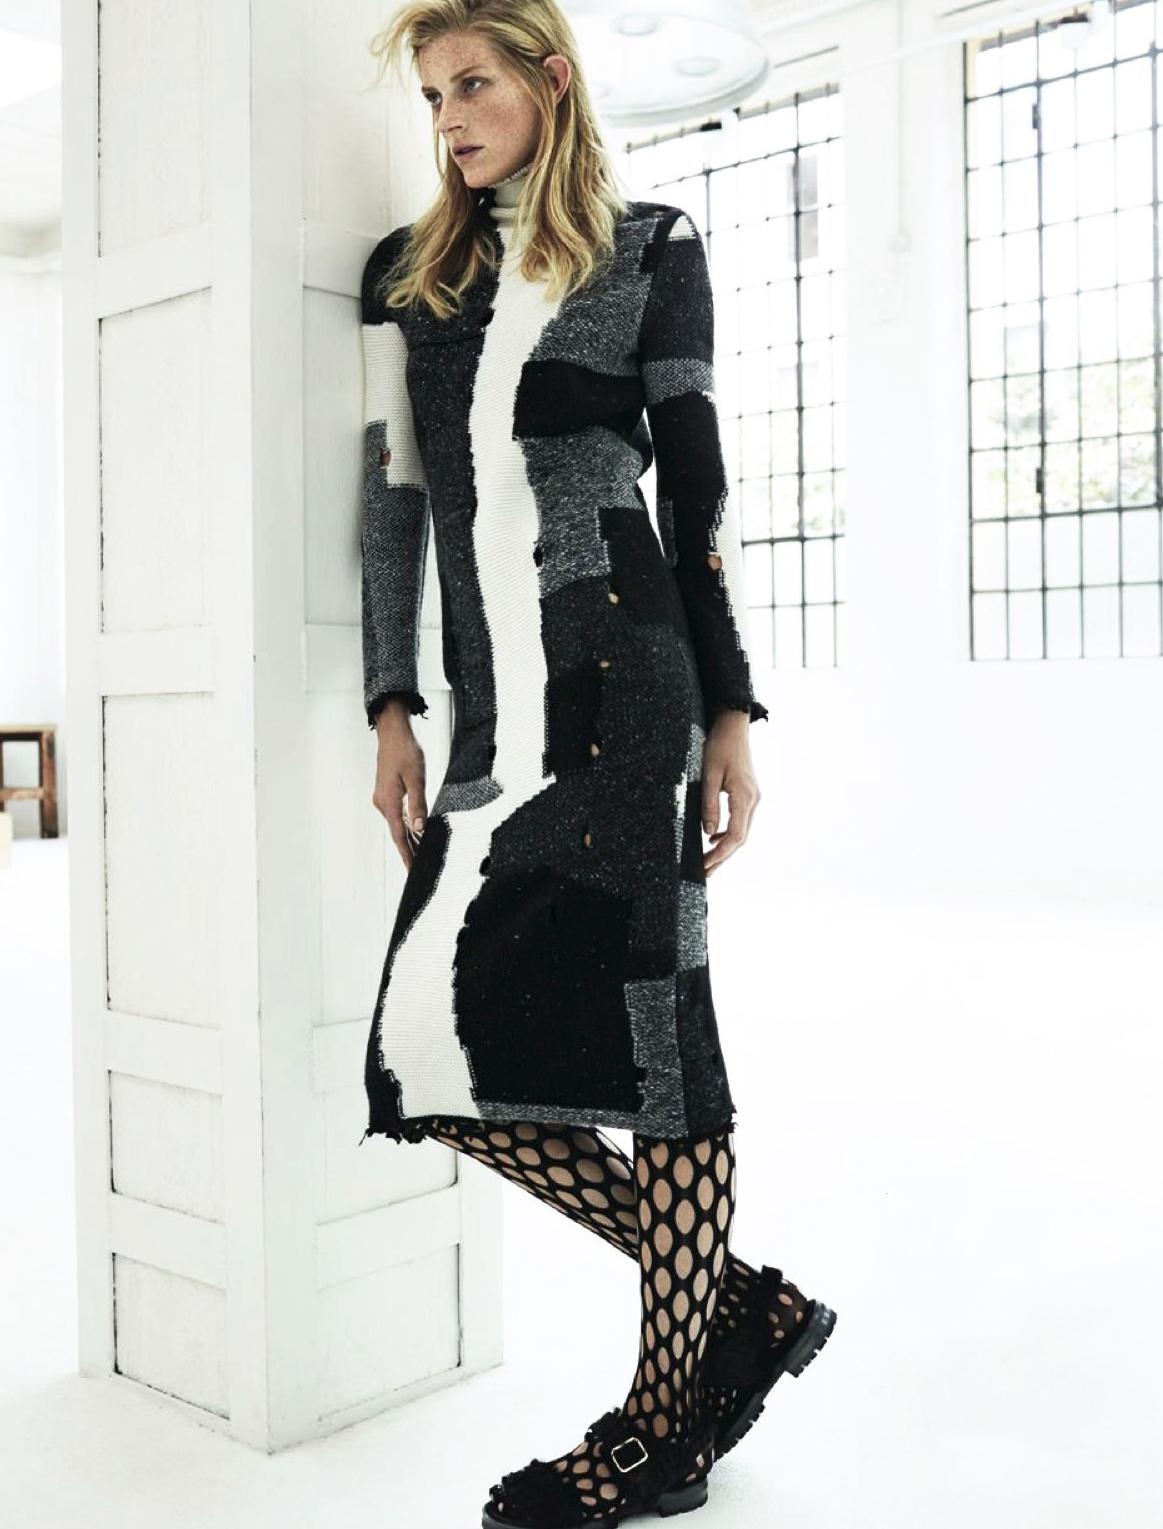 платье, Damir Doma; колготки, Proenza Schouler; сандалии, Attilio Giusti Leombruni